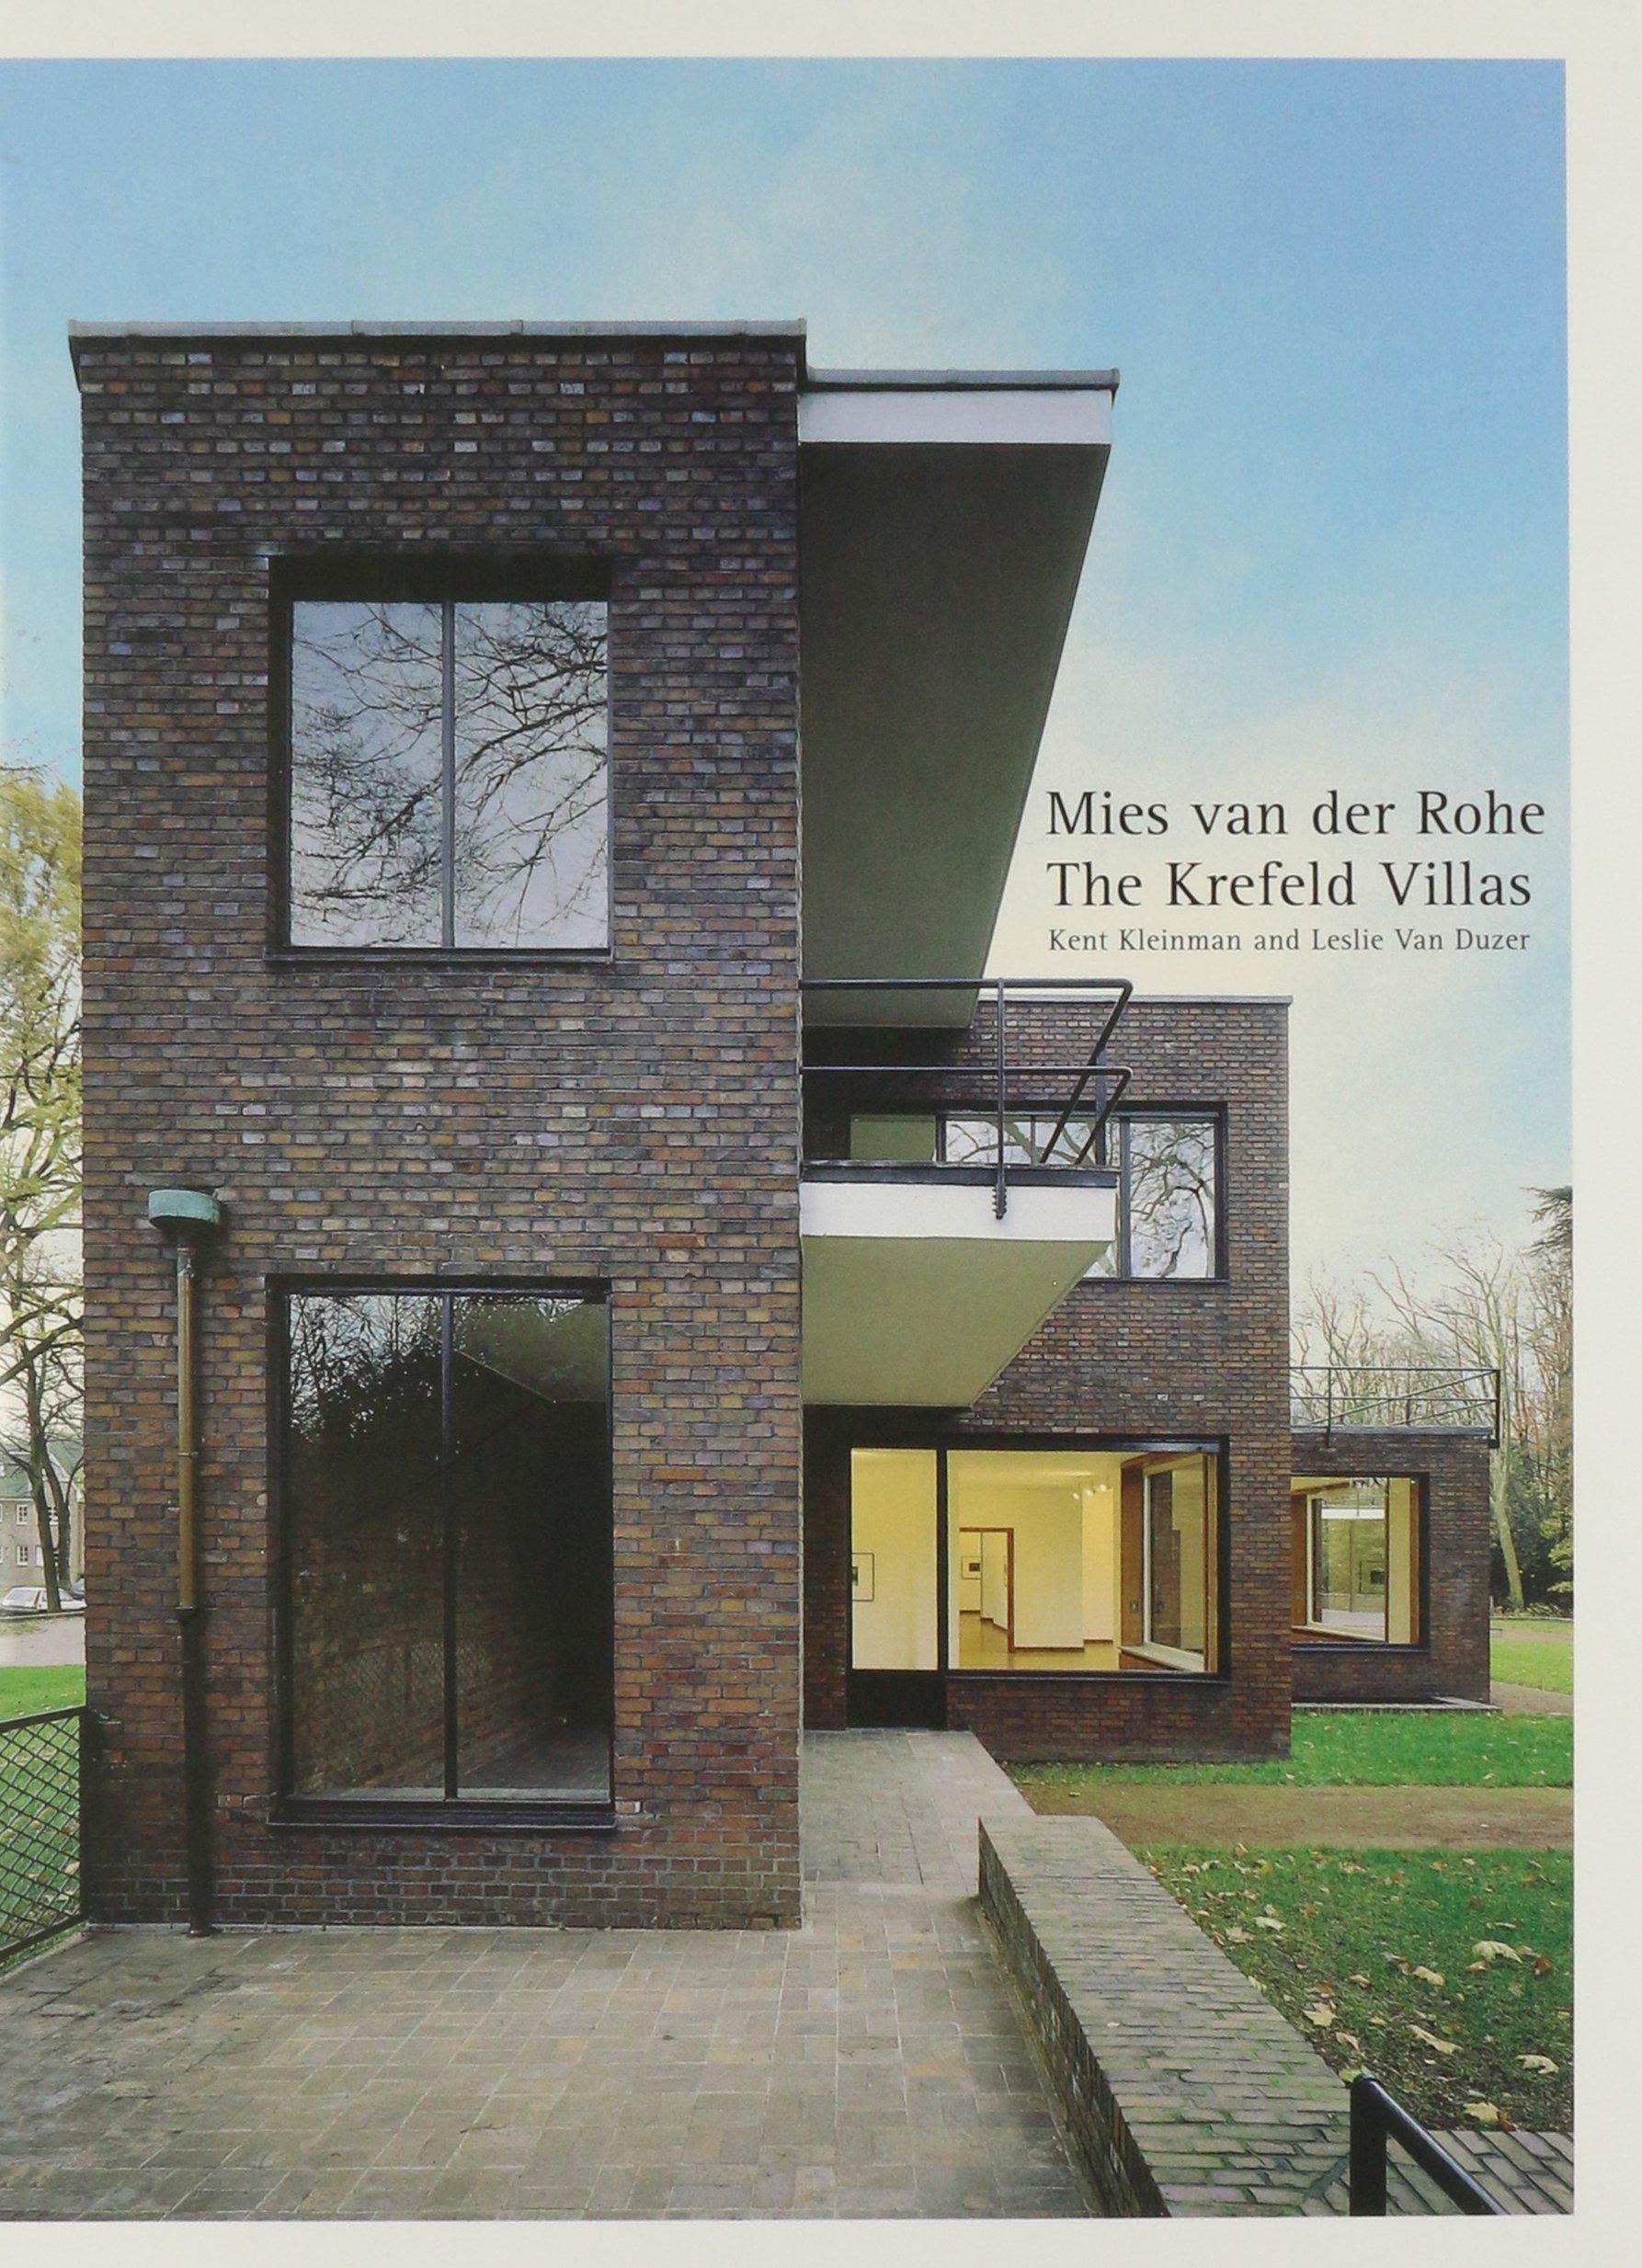 Mies Van Der Rohe S Krefeld Villas Kleinman Kent Van Duzer Leslie 9781568985039 Amazon Com Books